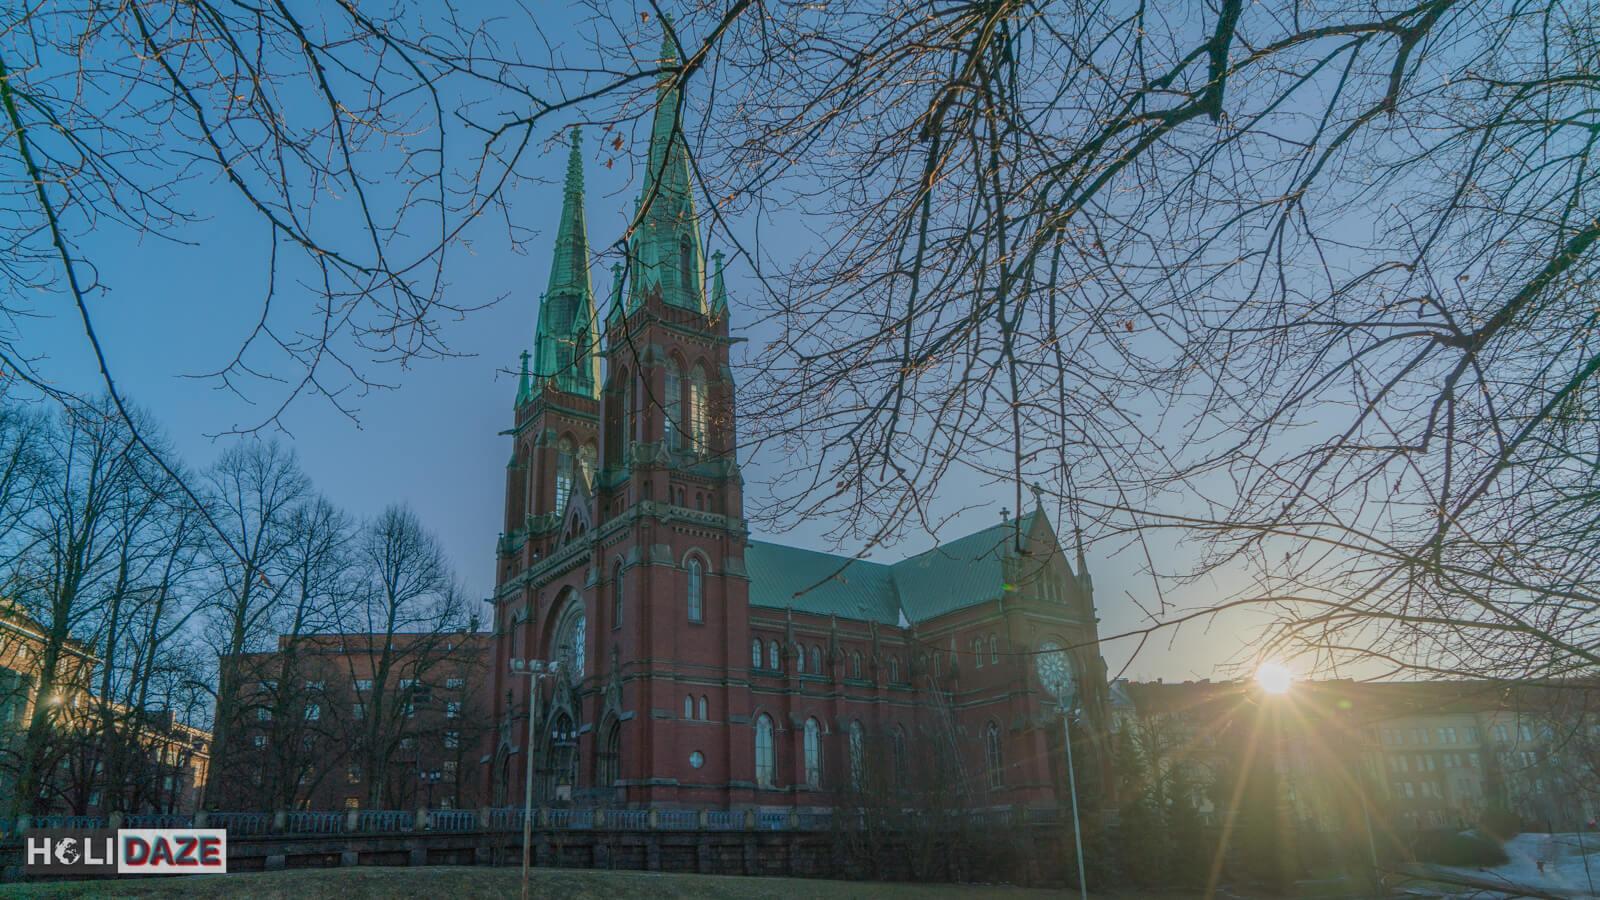 St. John's Church in Helsinki at sunset